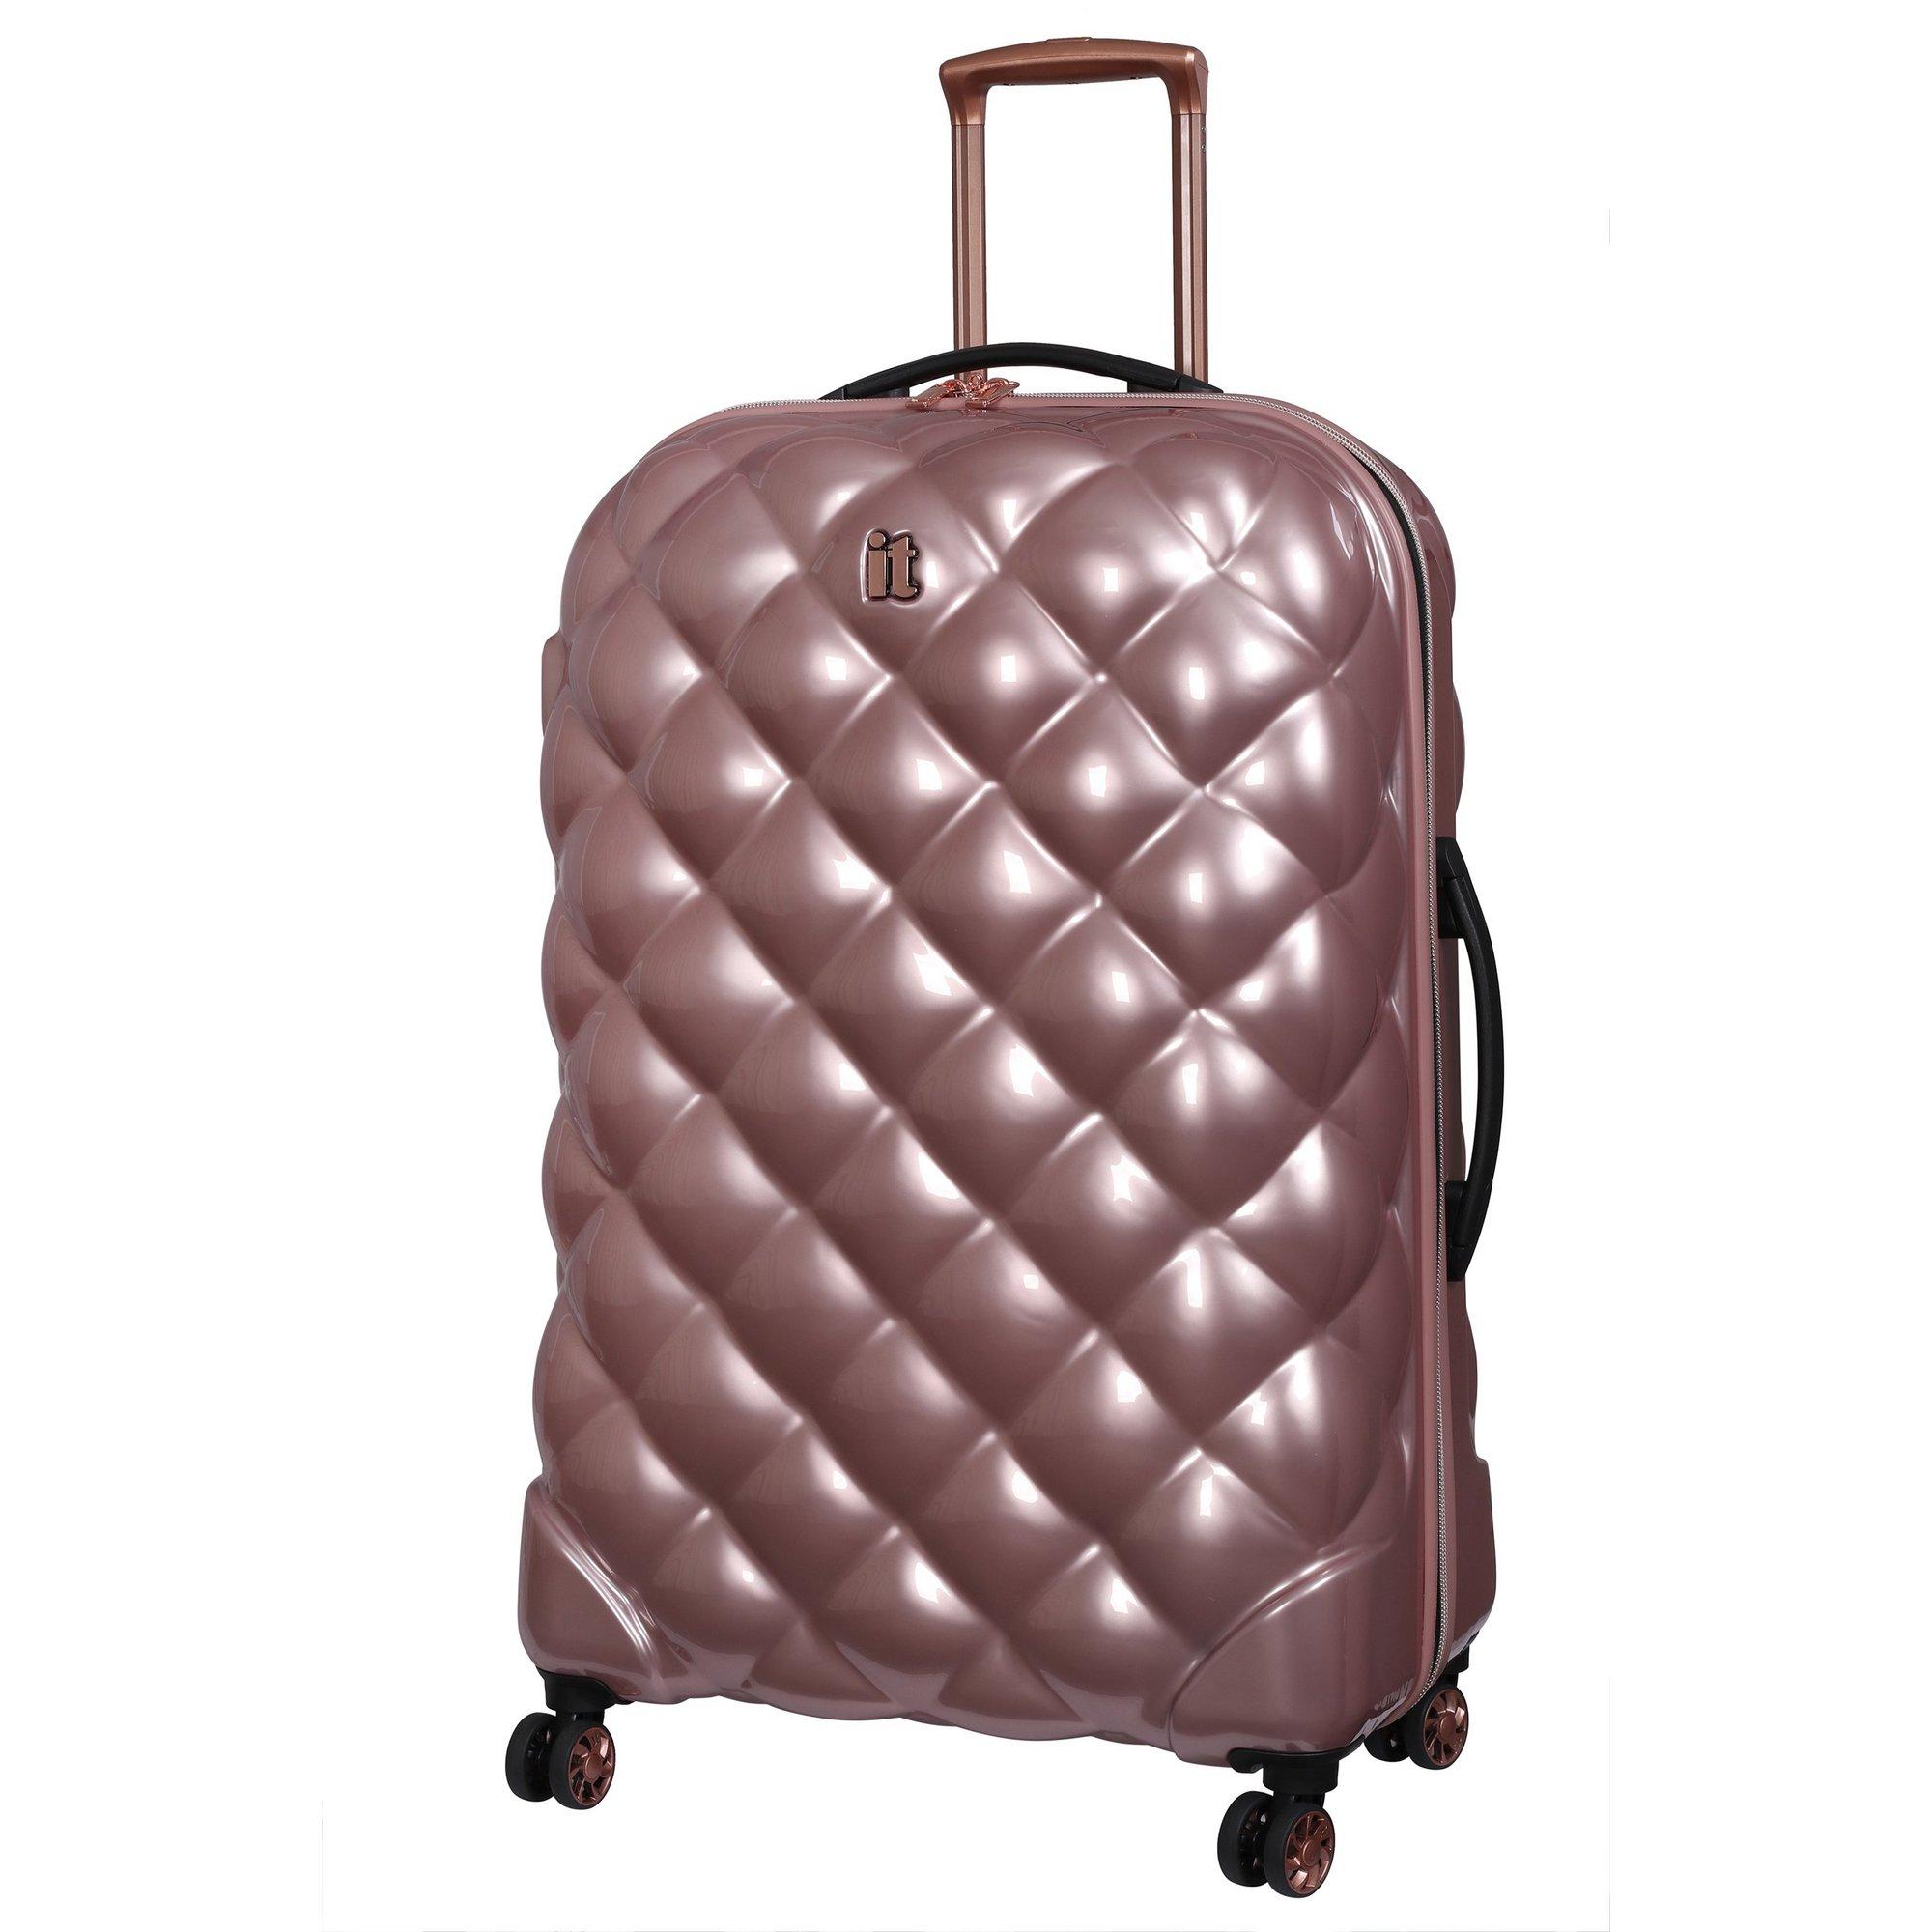 Image of IT Luggage St. Tropez Deux 8 Wheel Rose Gold Expander Suitcase